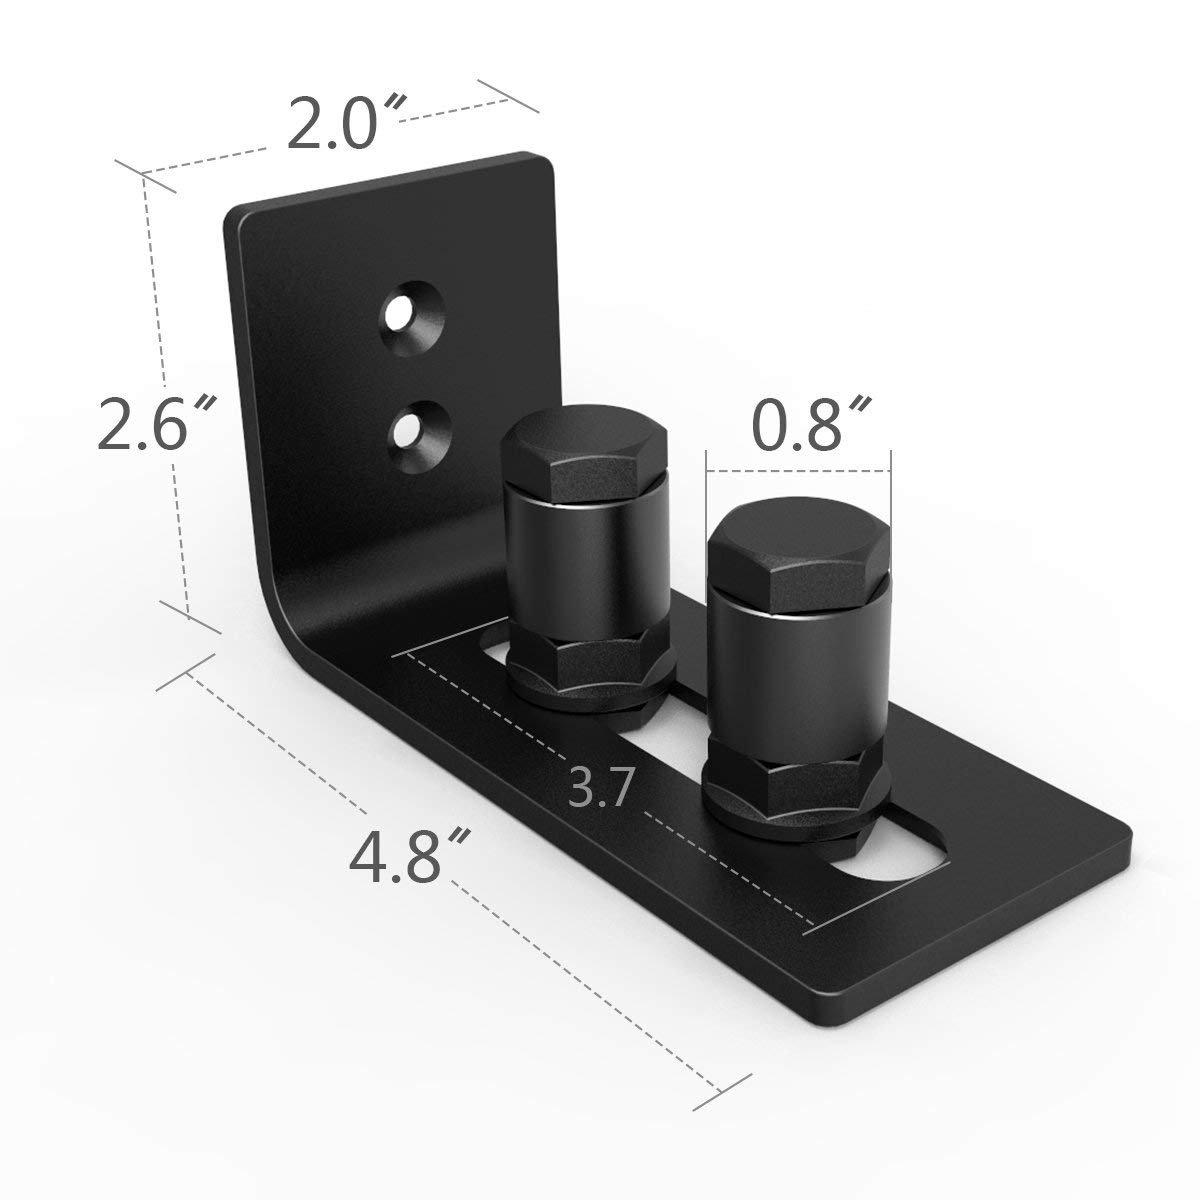 Barn Door Floor Guide Stay Roller - New Designed Stainless Sliding Door Hardware Adjustable Wall Mount Roller Guides for Pocket Door, Cabinets, Sliding Wood Doors (Black) by HOMEWINS (Image #2)